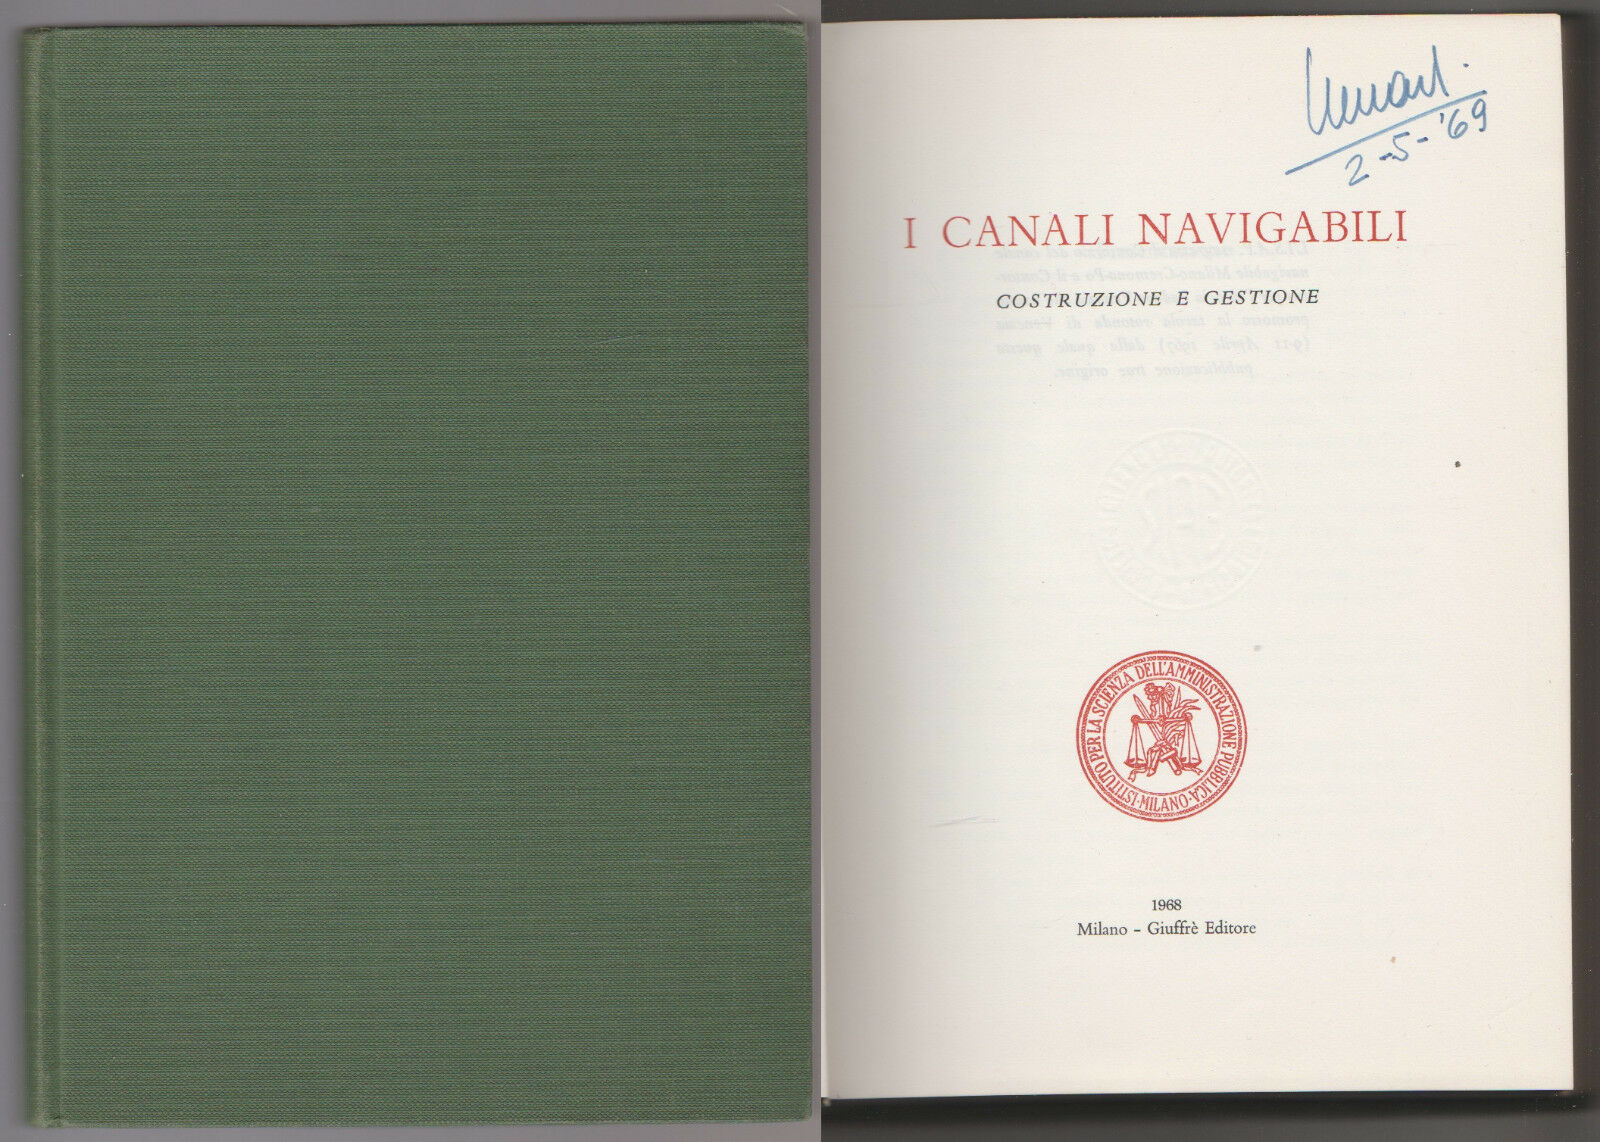 I canali navigabili. Costruzione e gestione - Contributi 7